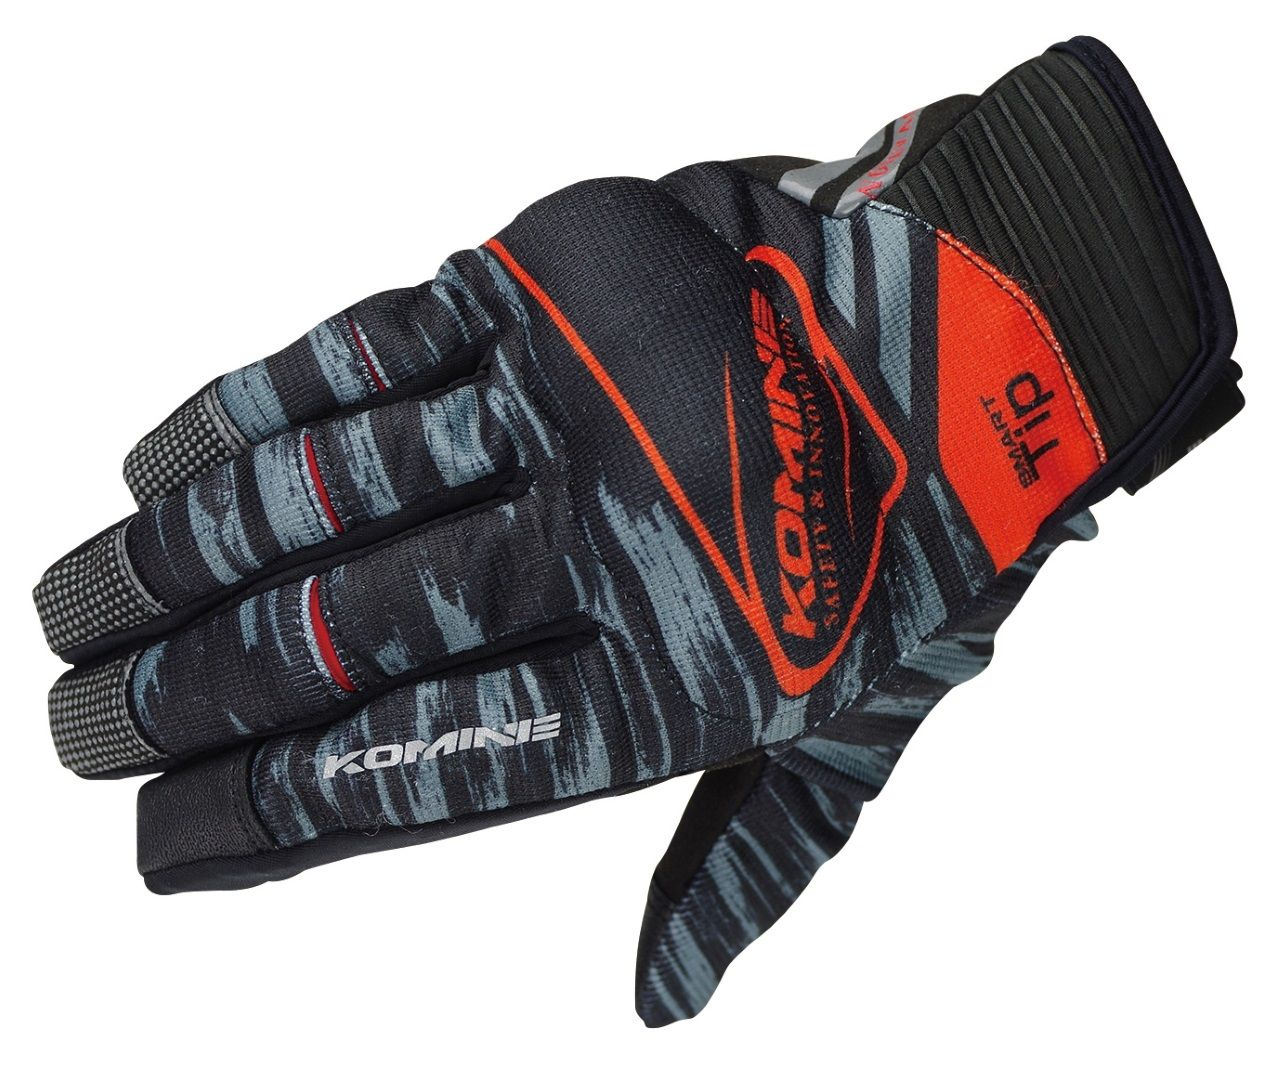 【KOMINE】GK-219 網格防護手套 - 「Webike-摩托百貨」